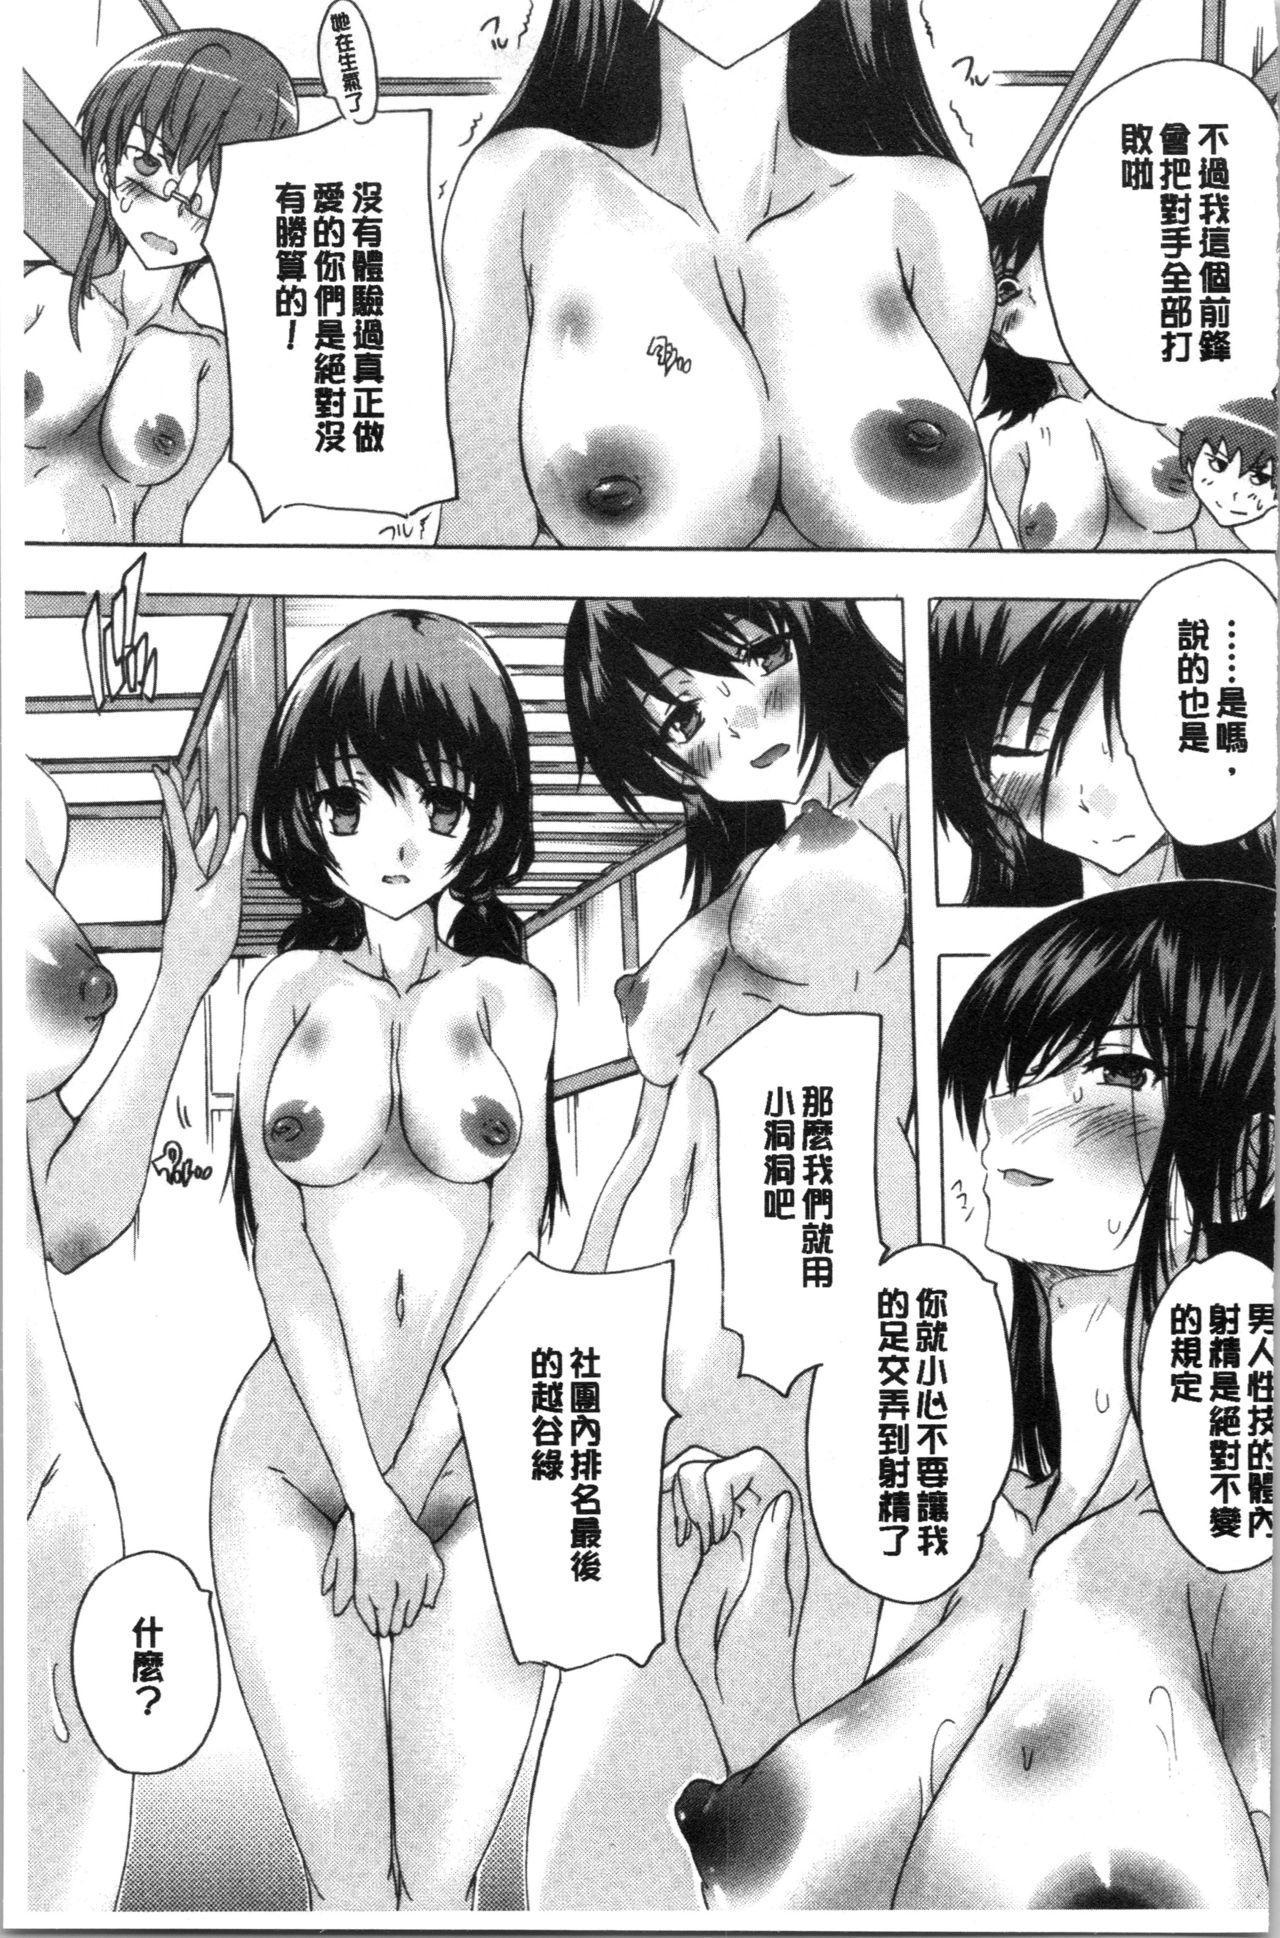 [Natsuka Q-Ya] Hisshuu!! Sex-bu - SEIGI-DO The Ultimate Martial Arts   必修!!性愛淫交部 [Chinese] 149